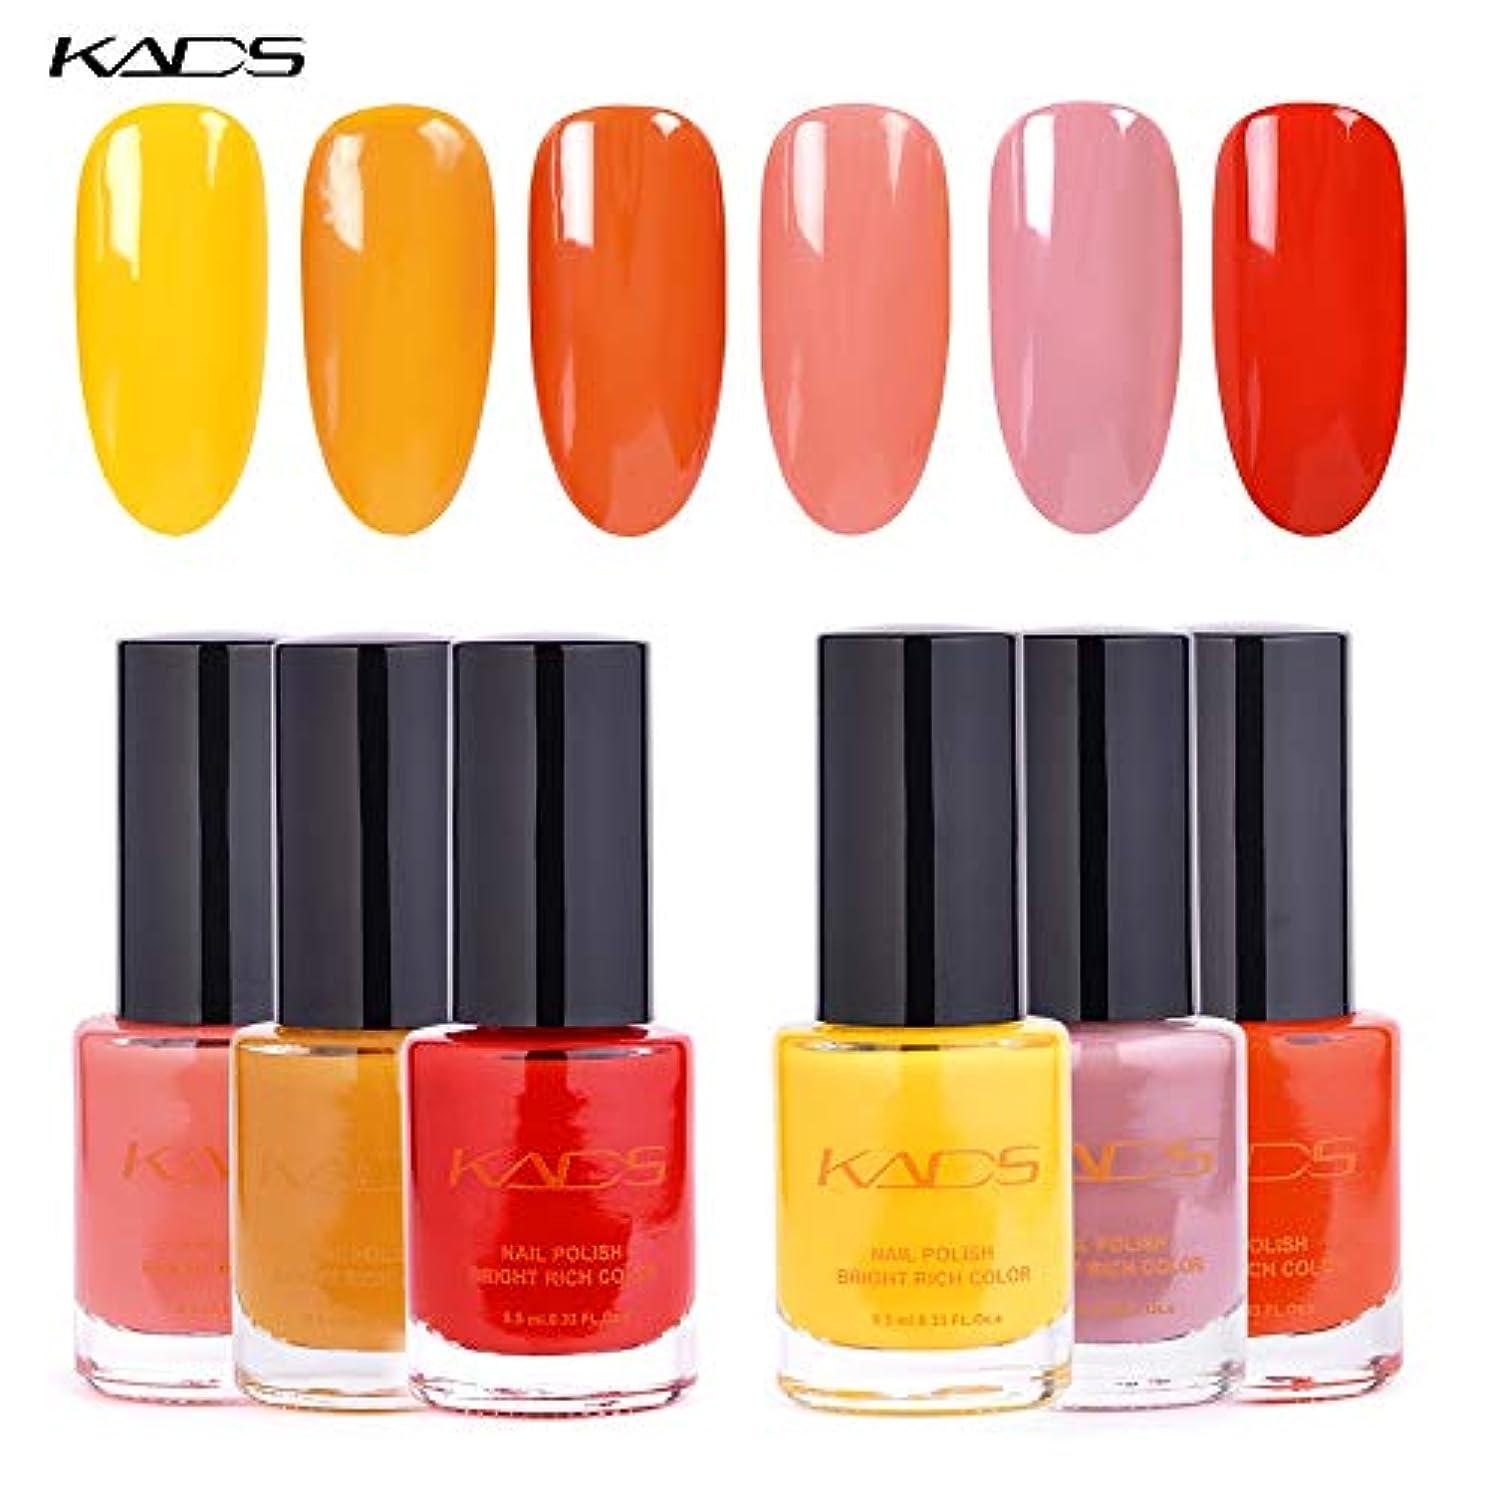 KADS ネイルポリッシュ ゼリーシリーズ ピンク/オレンジ/イエロー 6色入り 9.5ML 艶長持ち マニキュアセット